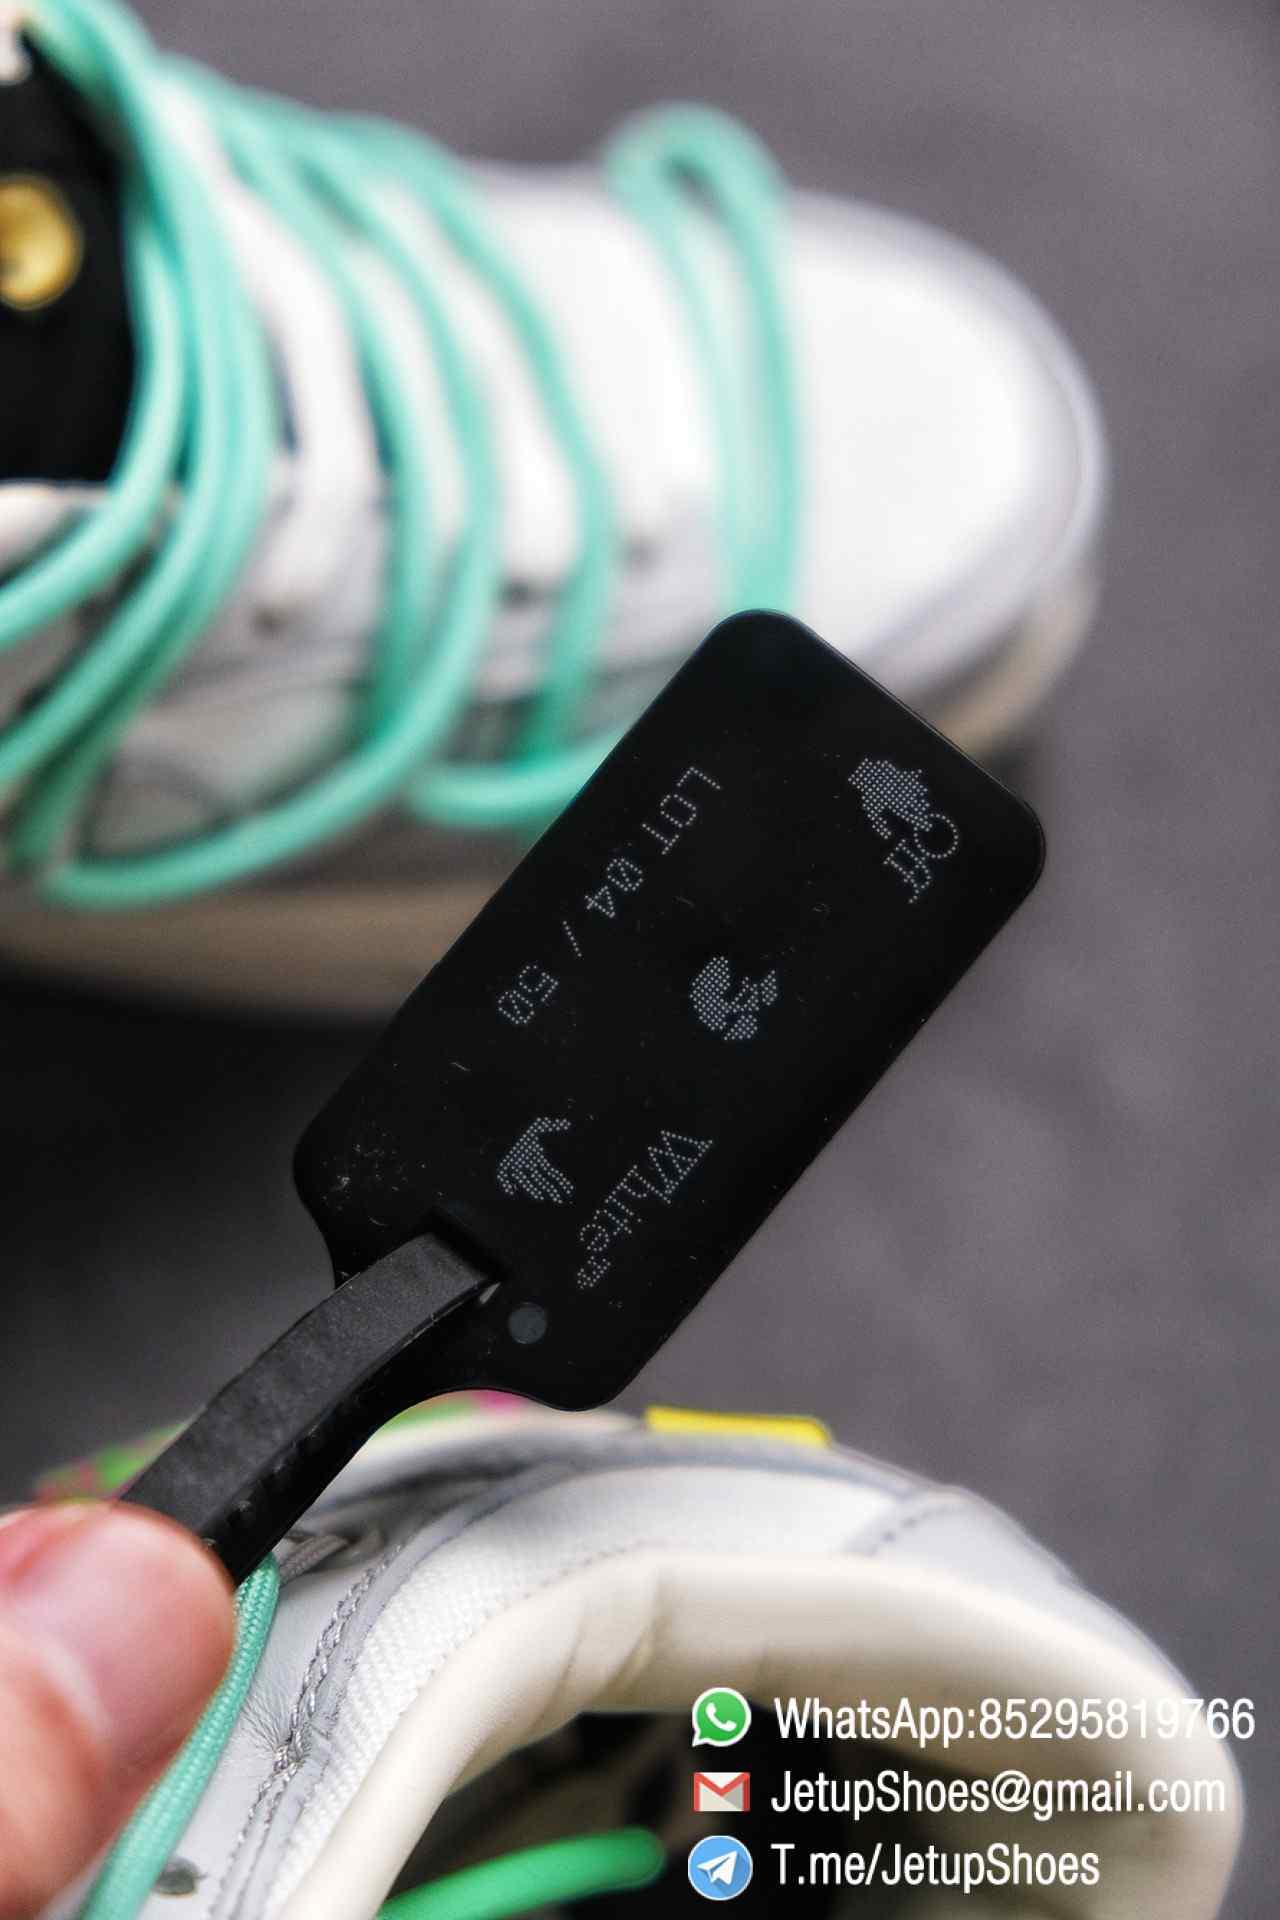 Best Replica Nike Sneakers 0ff White x Nike Dunk Low 04 of 50 SKU DM1602 114 Top RepSneakers Supplier 011